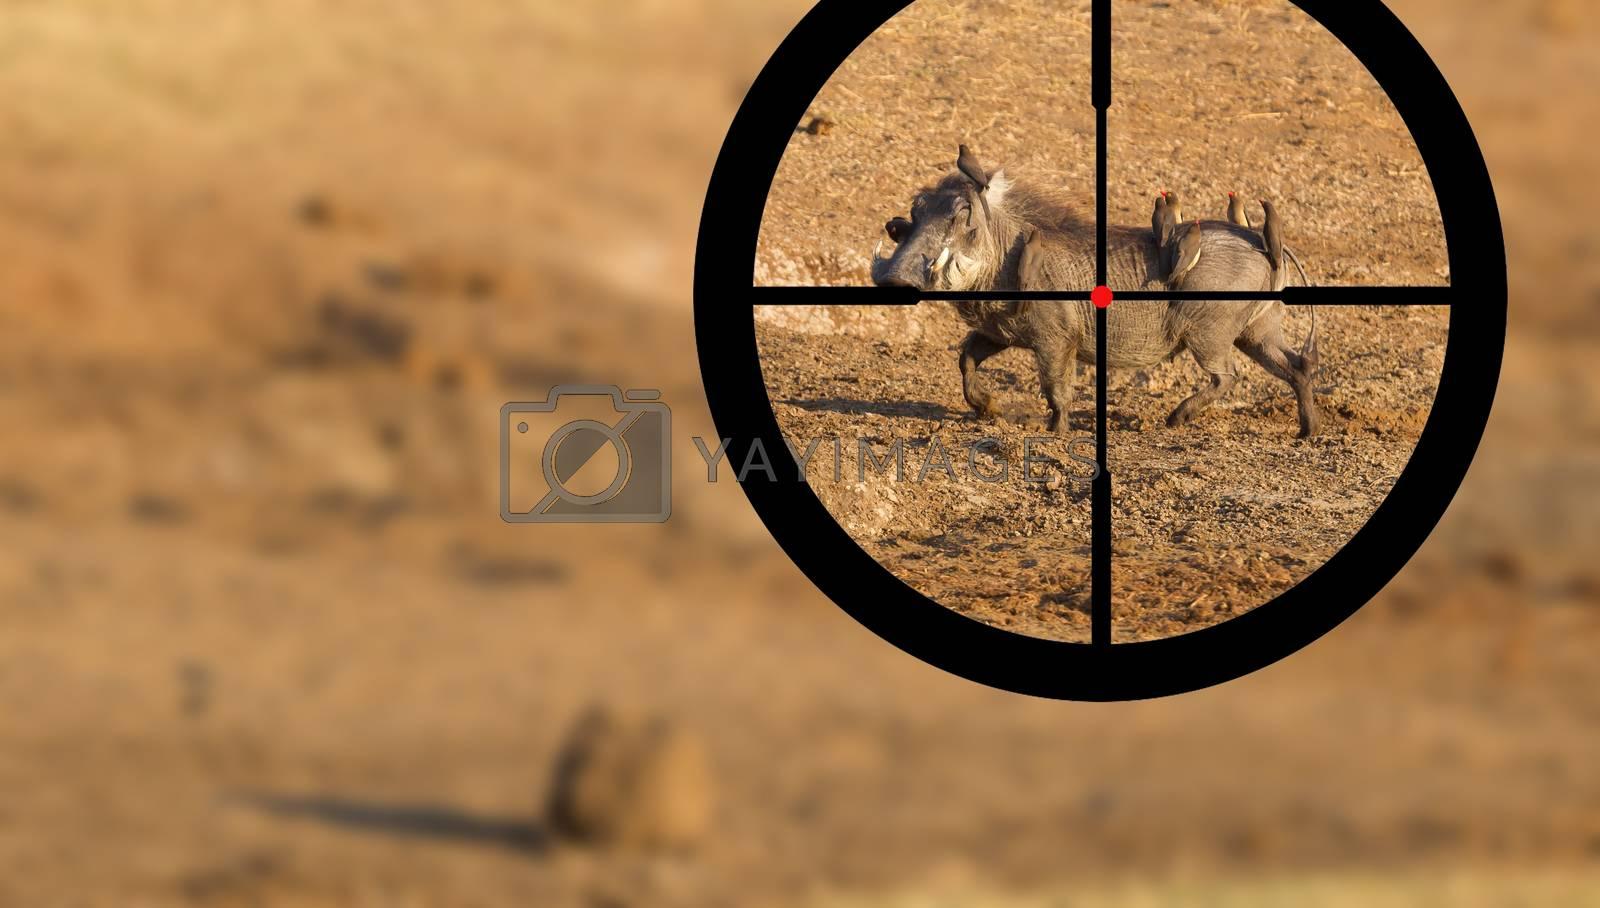 Hunting warthog in Botswana by michaklootwijk